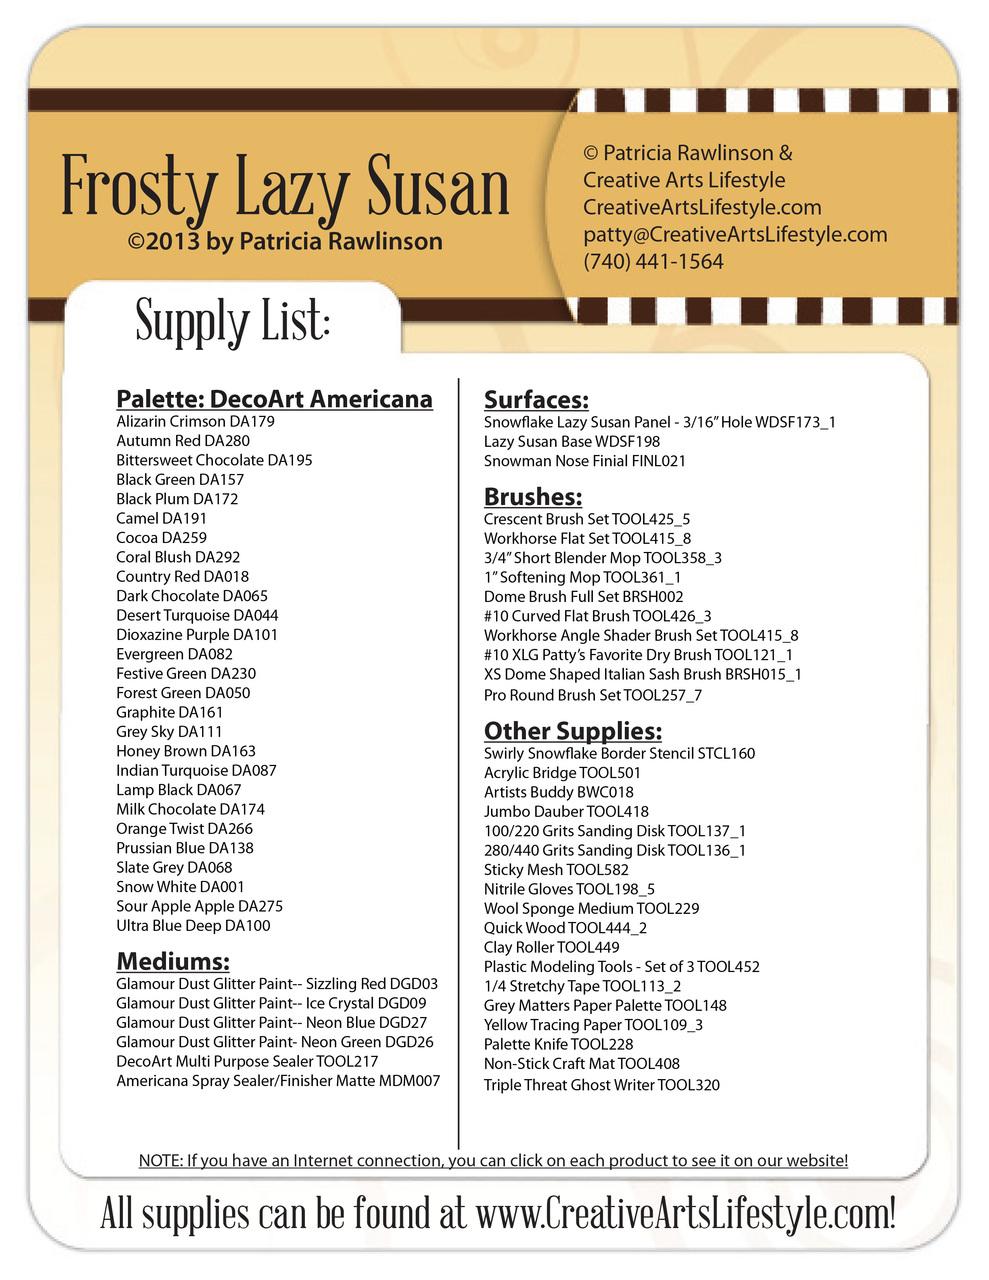 Frosty Lazy Susan Pattern Packet - Patricia Rawlinson